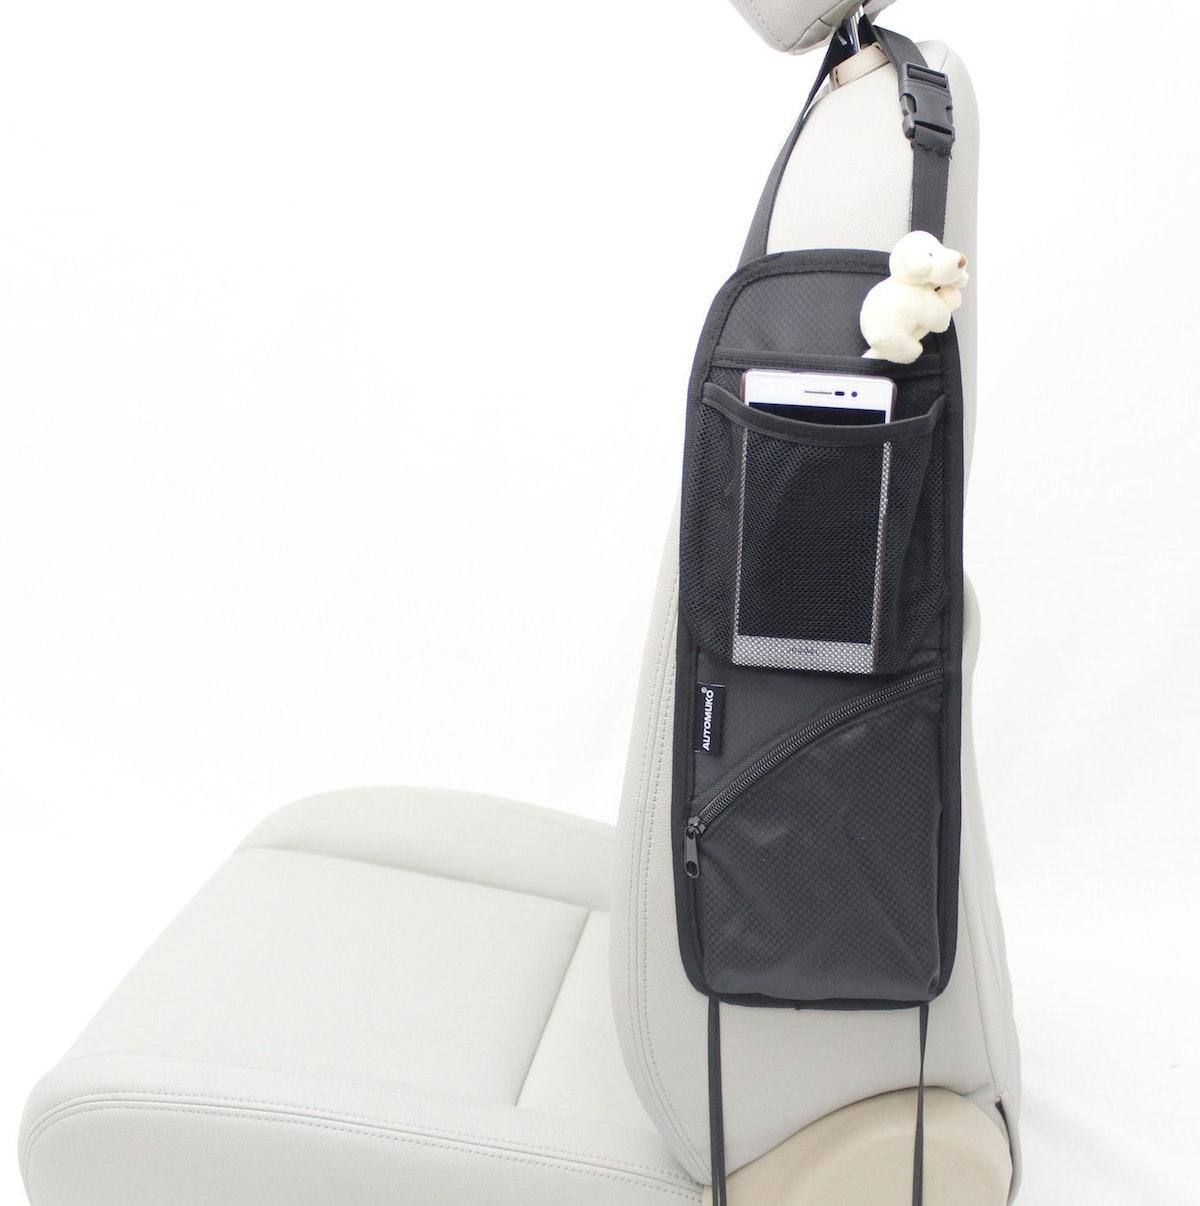 Automuko Seat Side Pocket